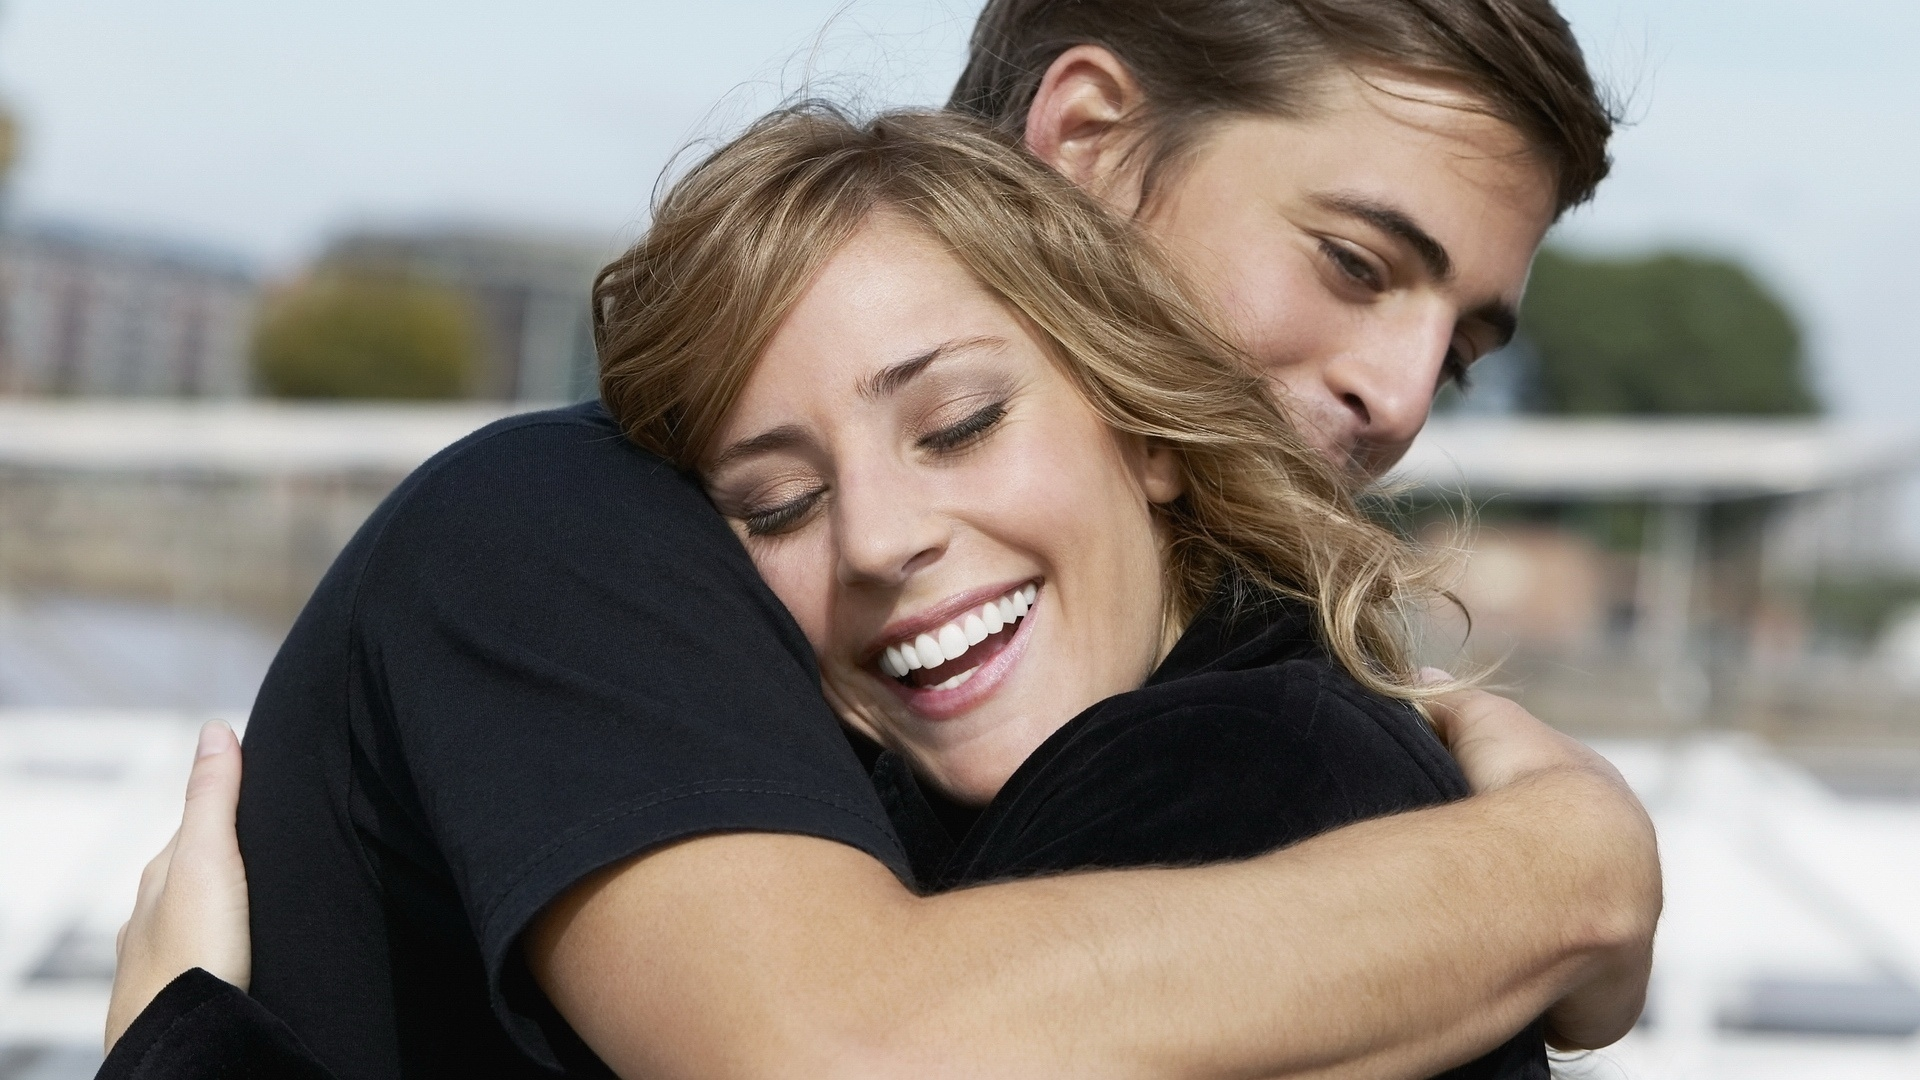 A iubi cu adevarat - Adrian Nuta.  couple_love_happiness_smile_hug_25676_1920x1080